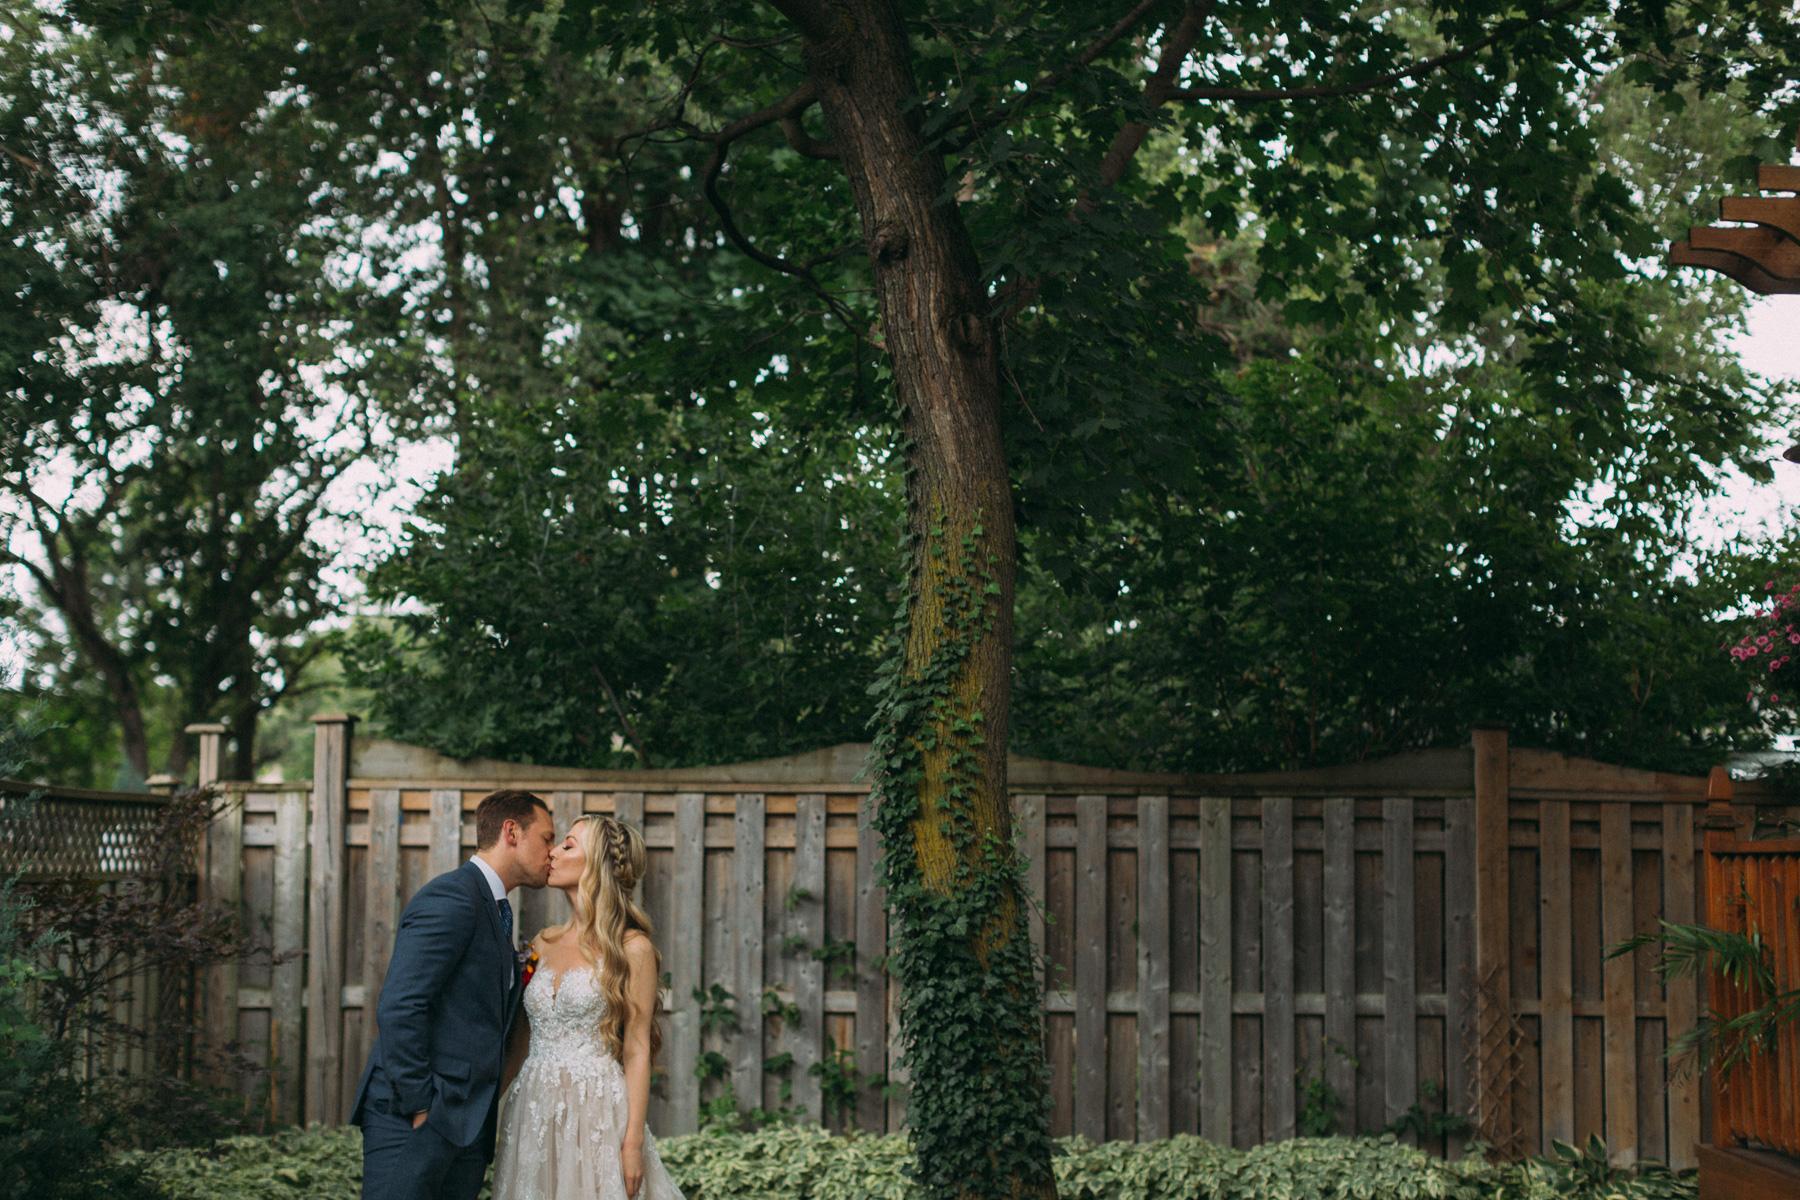 La-Maquette-wedding-by-Toronto-modern-wedding-photographer-Sam-Wong_16.jpg